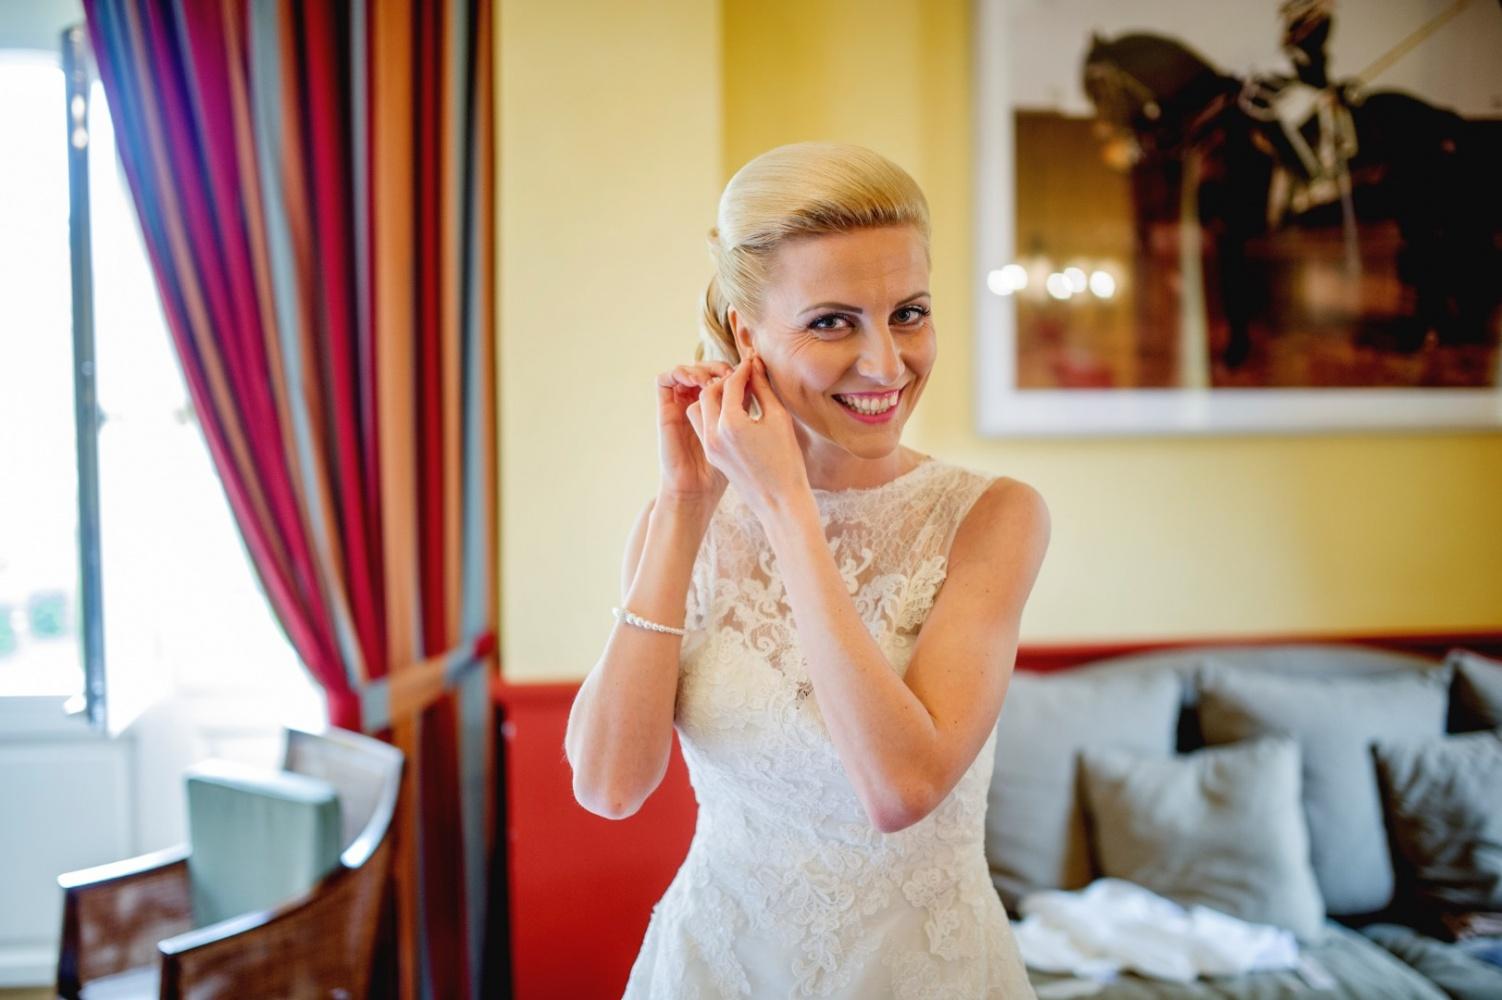 http://www.fotoz.sk/images/gallery-26/normal/svadba_hotel-chateau-bela_032.jpg